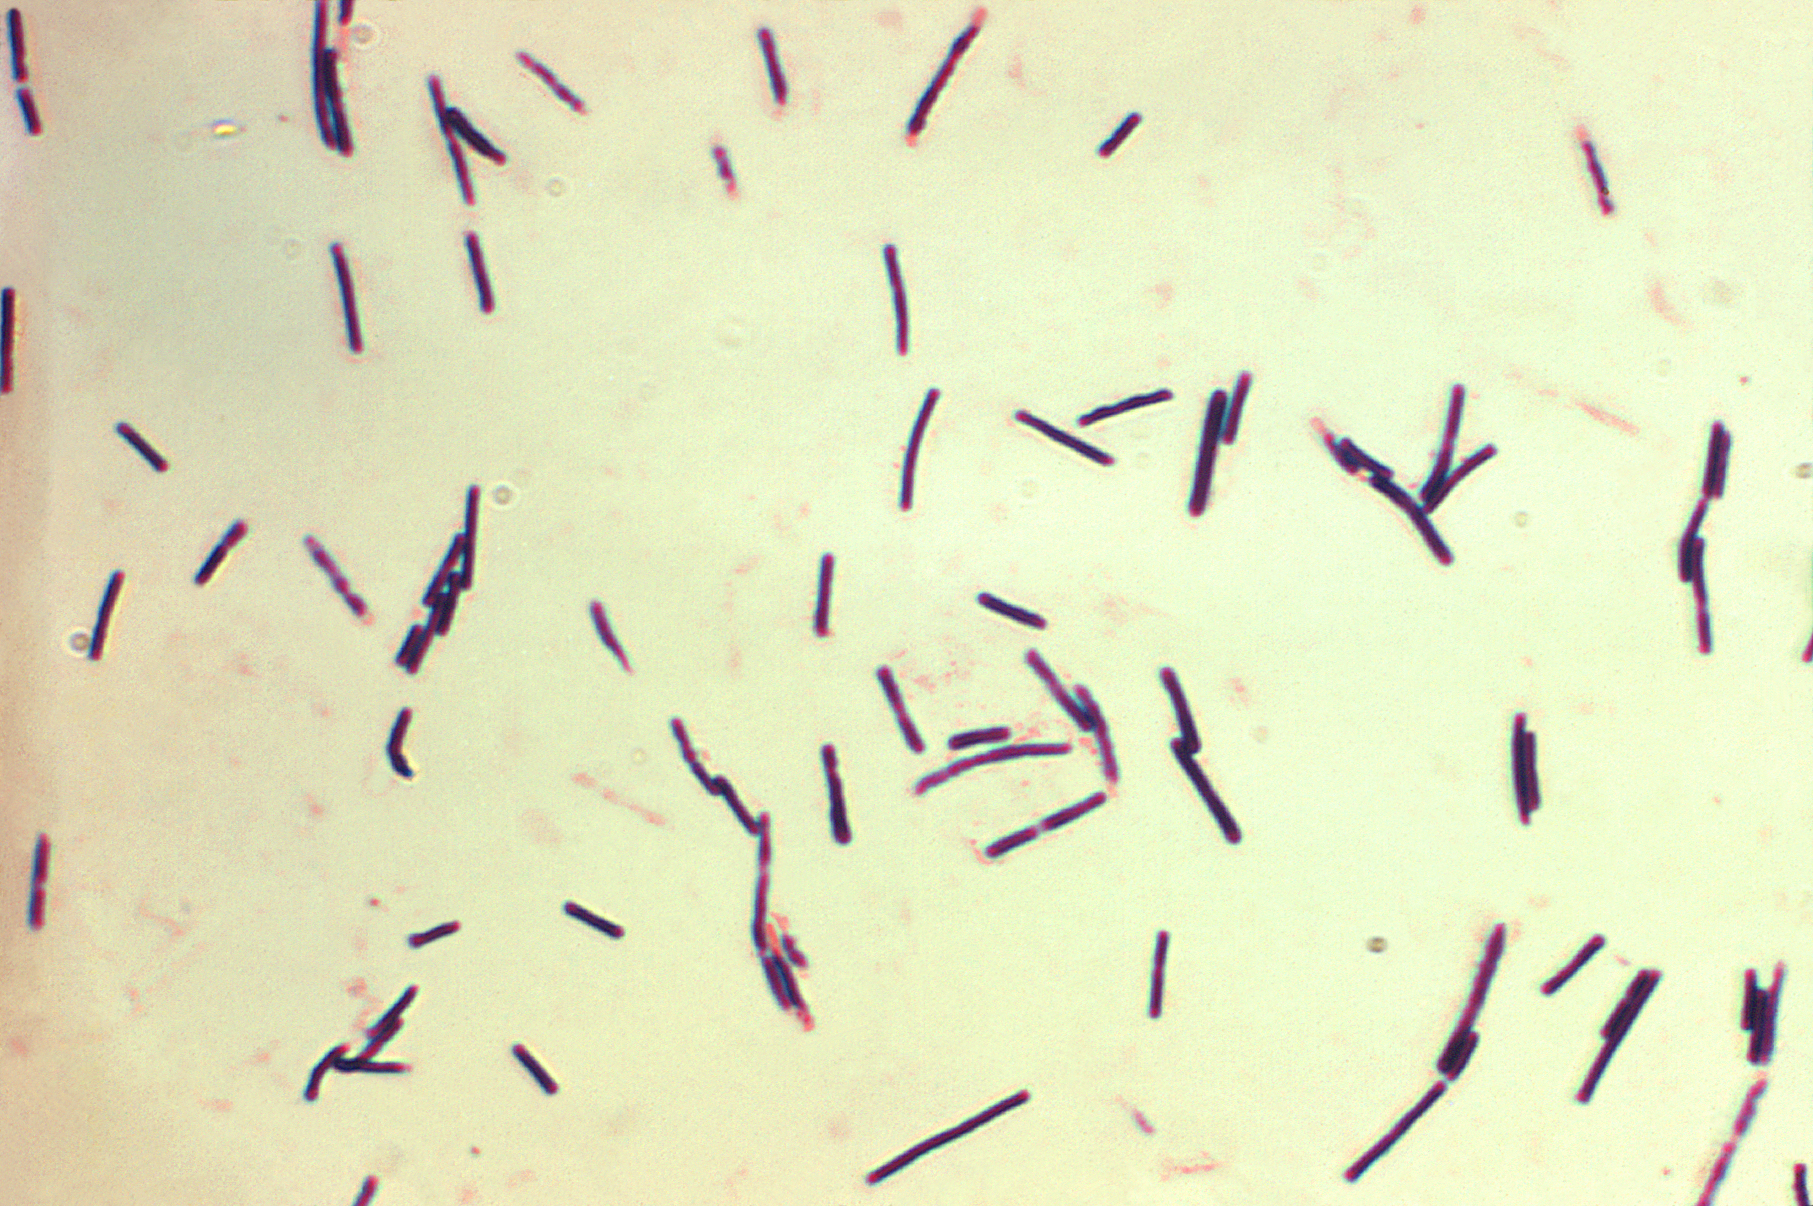 Clostridium difficile toxine A/B